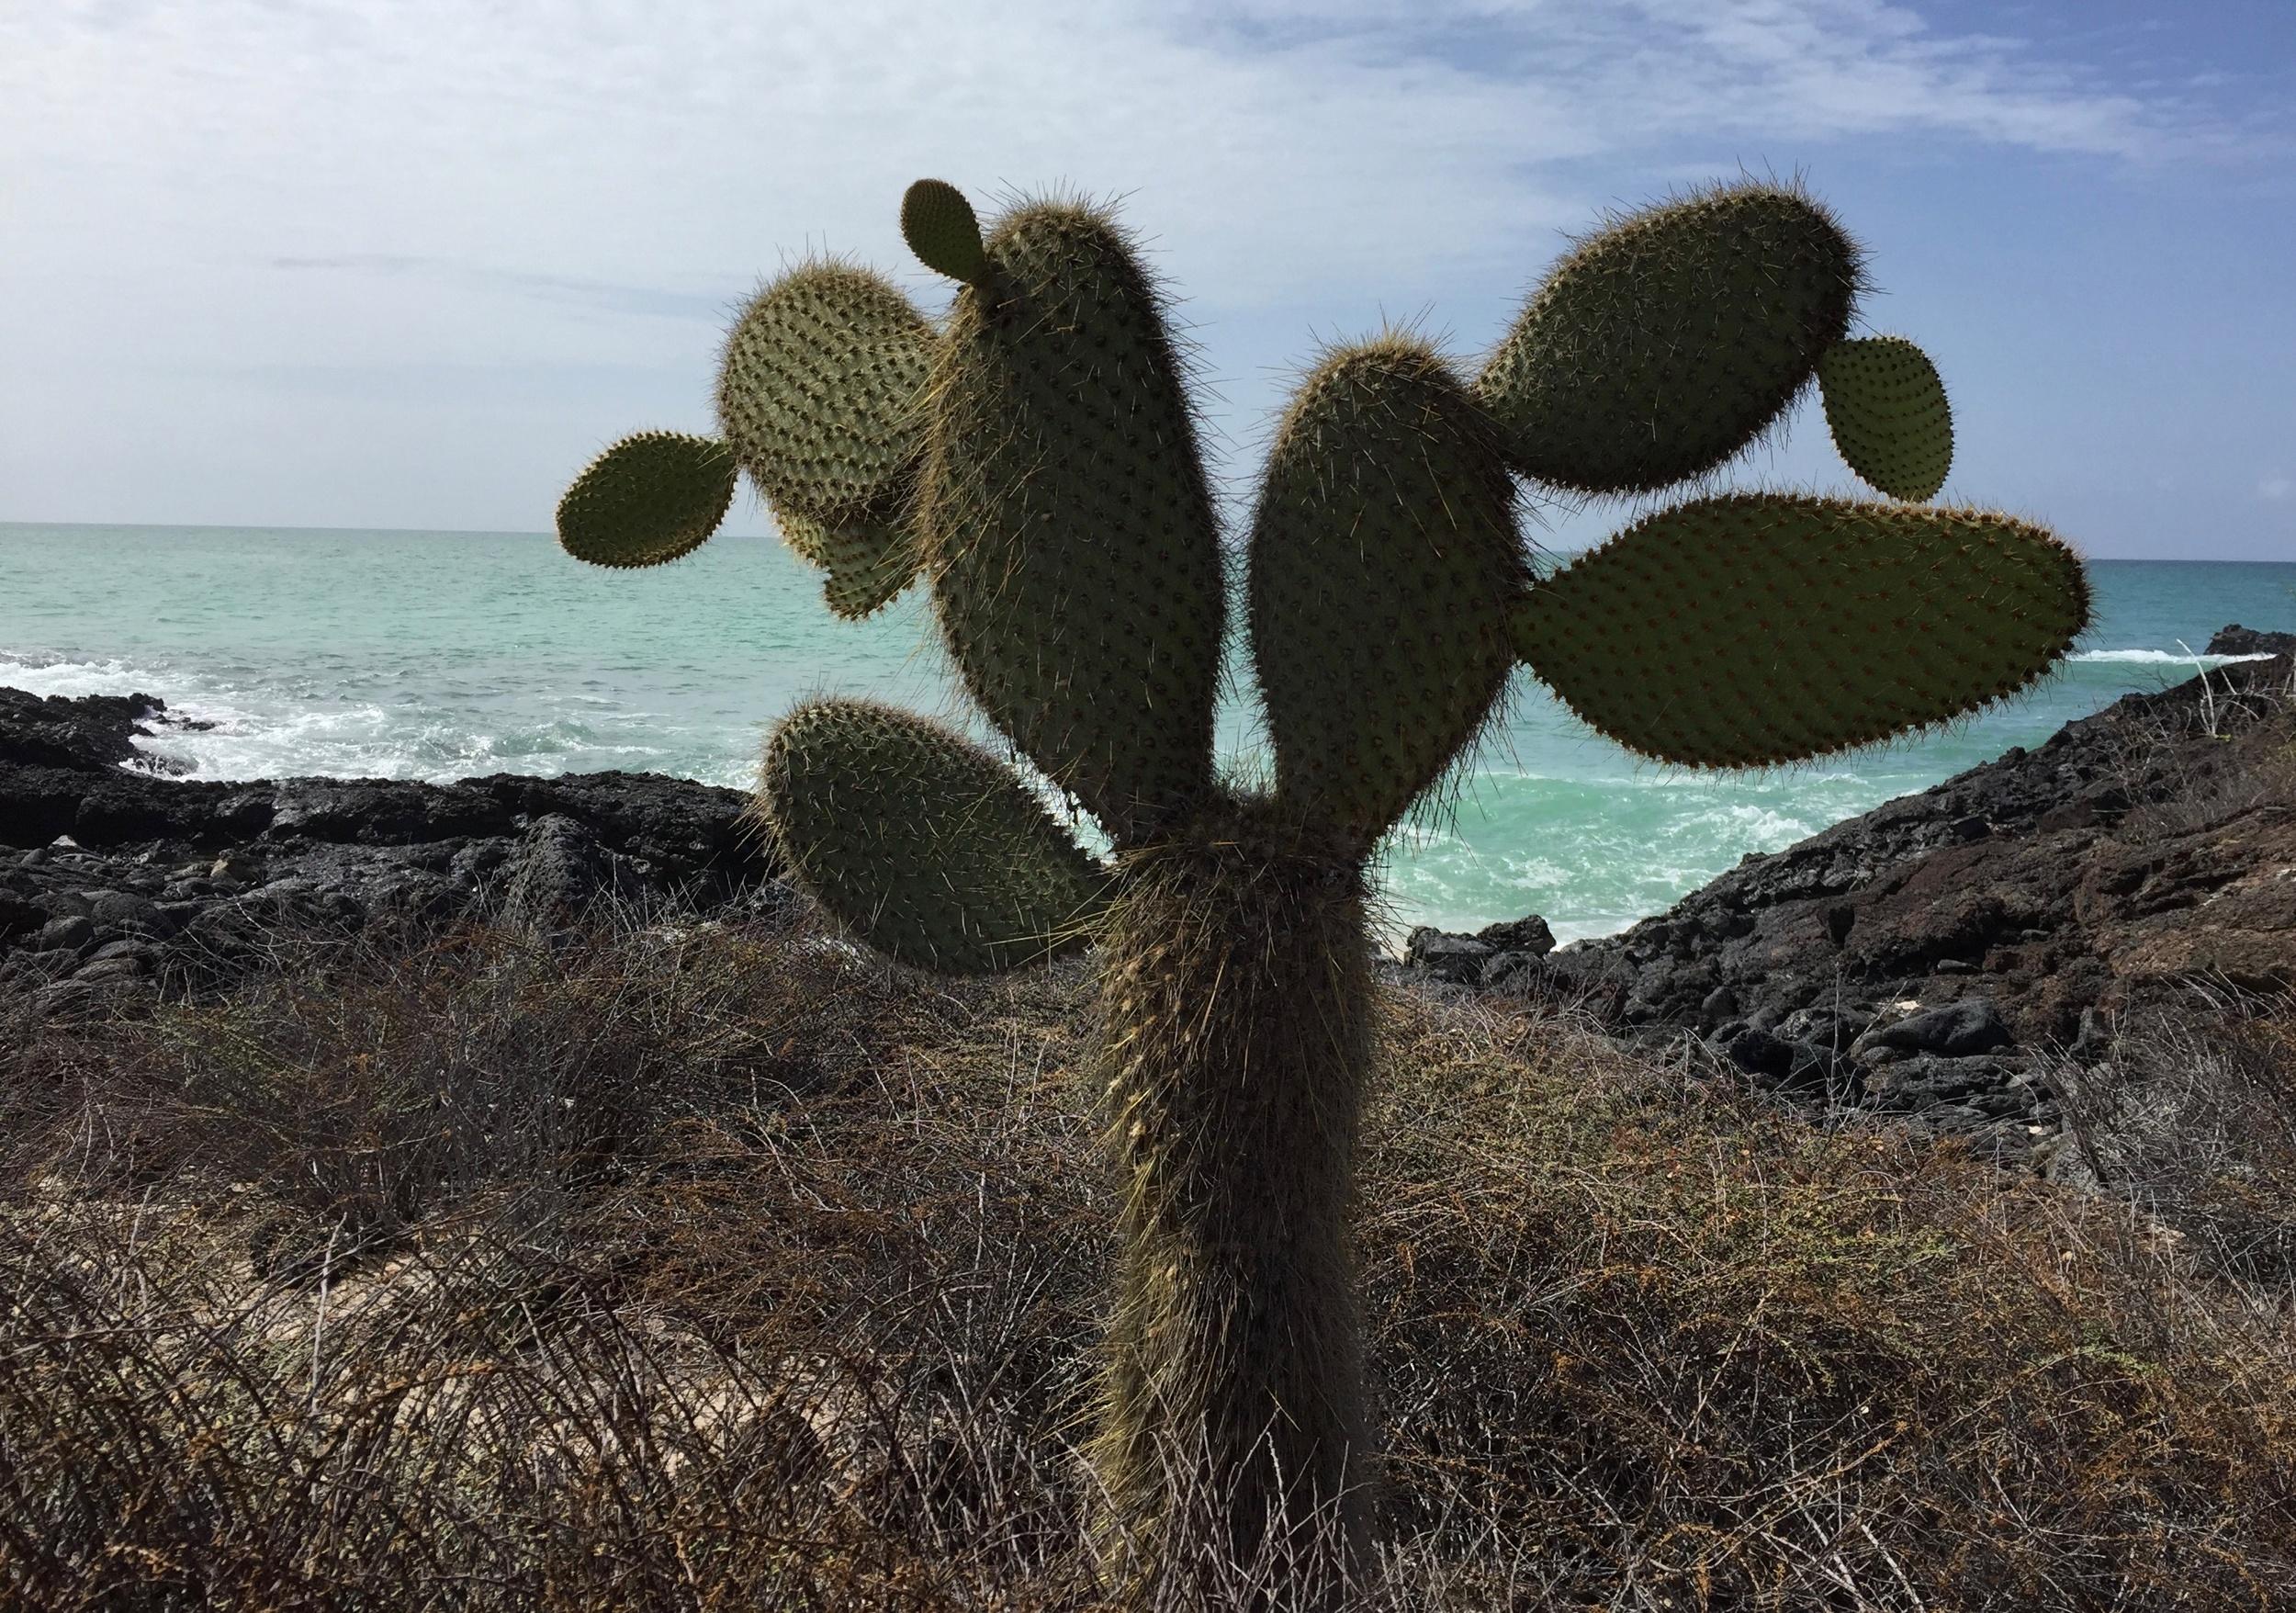 Prickly pear cacti on Santa Cruz Island are reminiscent of Baja California.